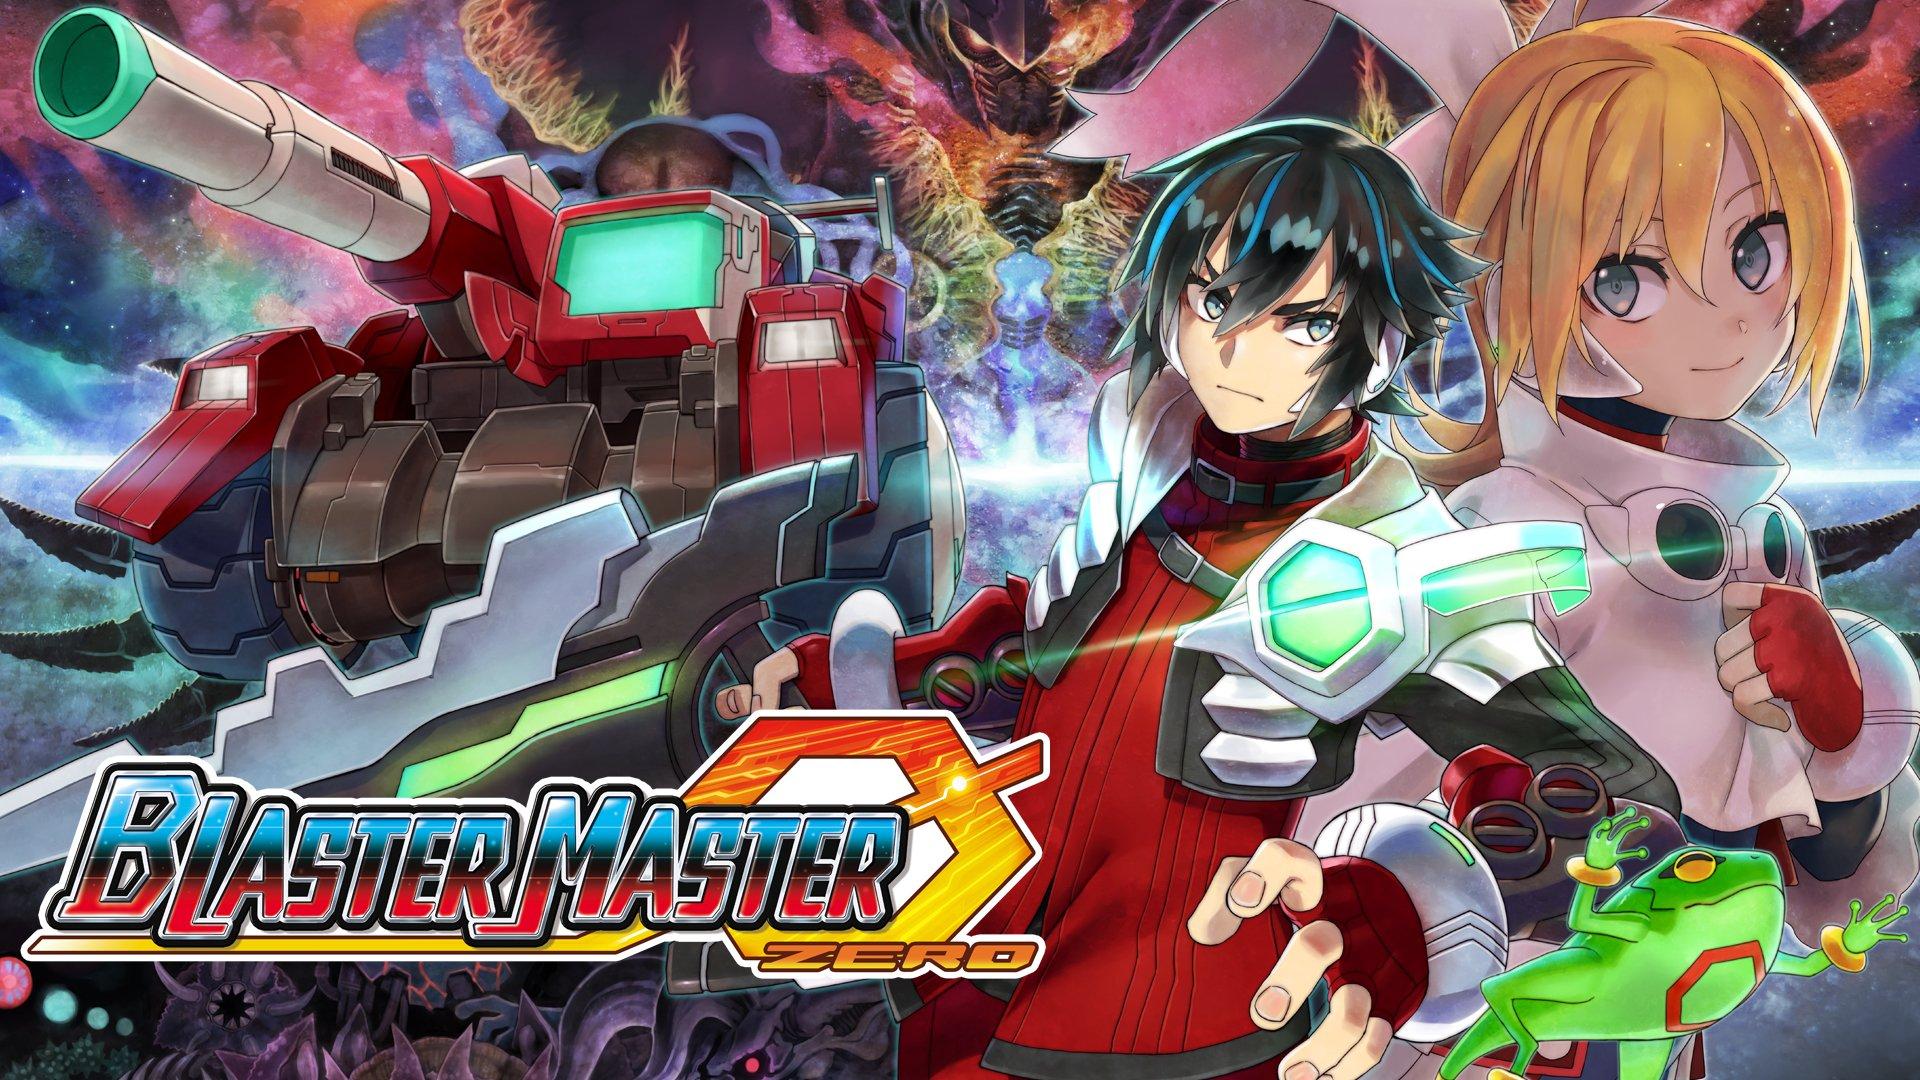 Review: Blaster Master -Zero- (Nintendo Switch) | GBAtemp